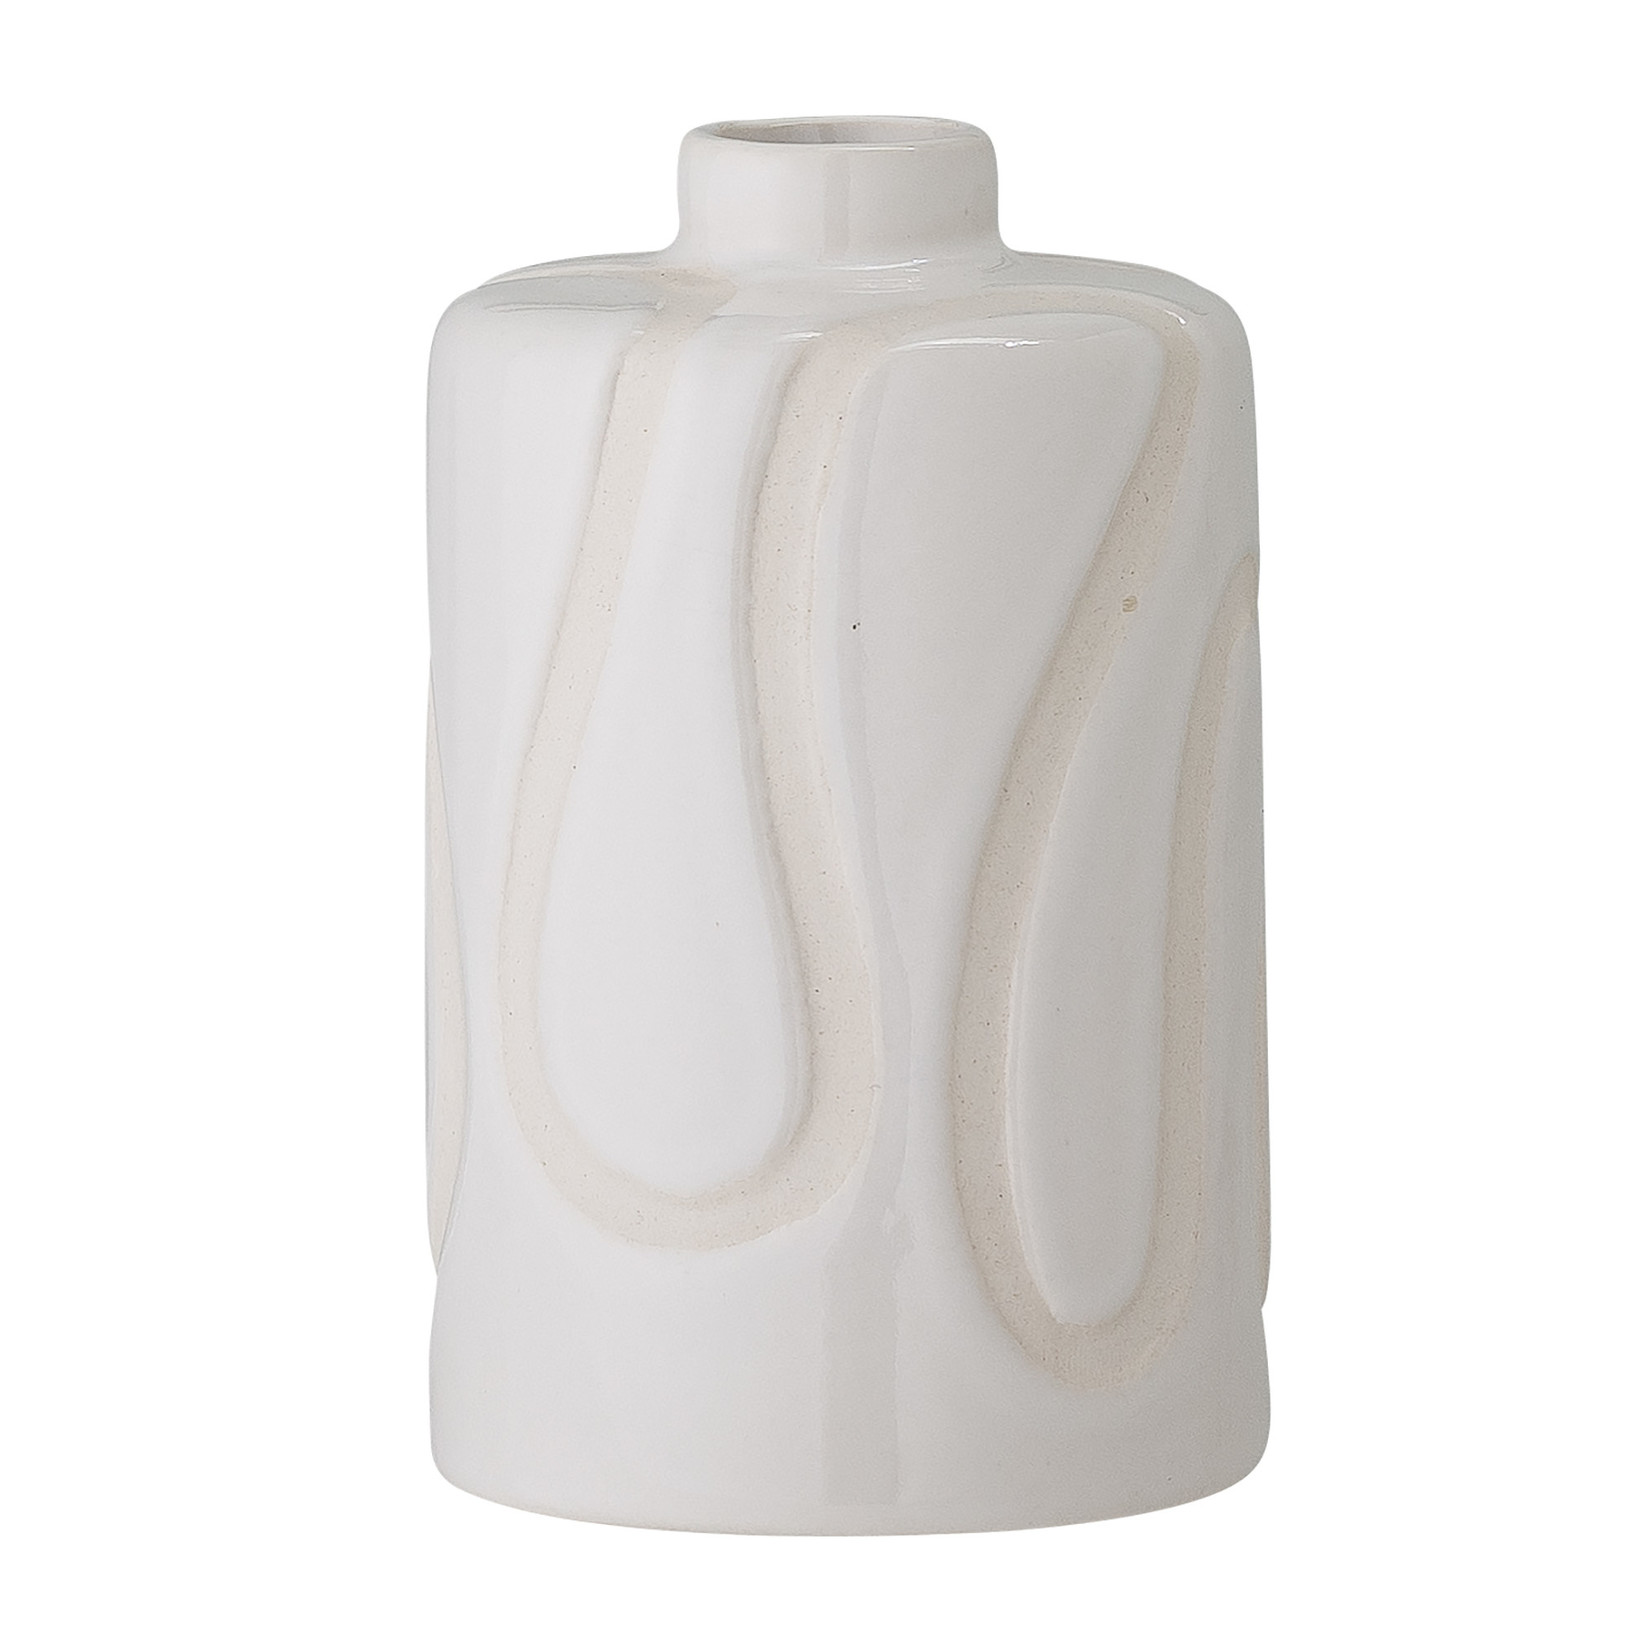 Bloomingville  Elice Vase, White, Stoneware